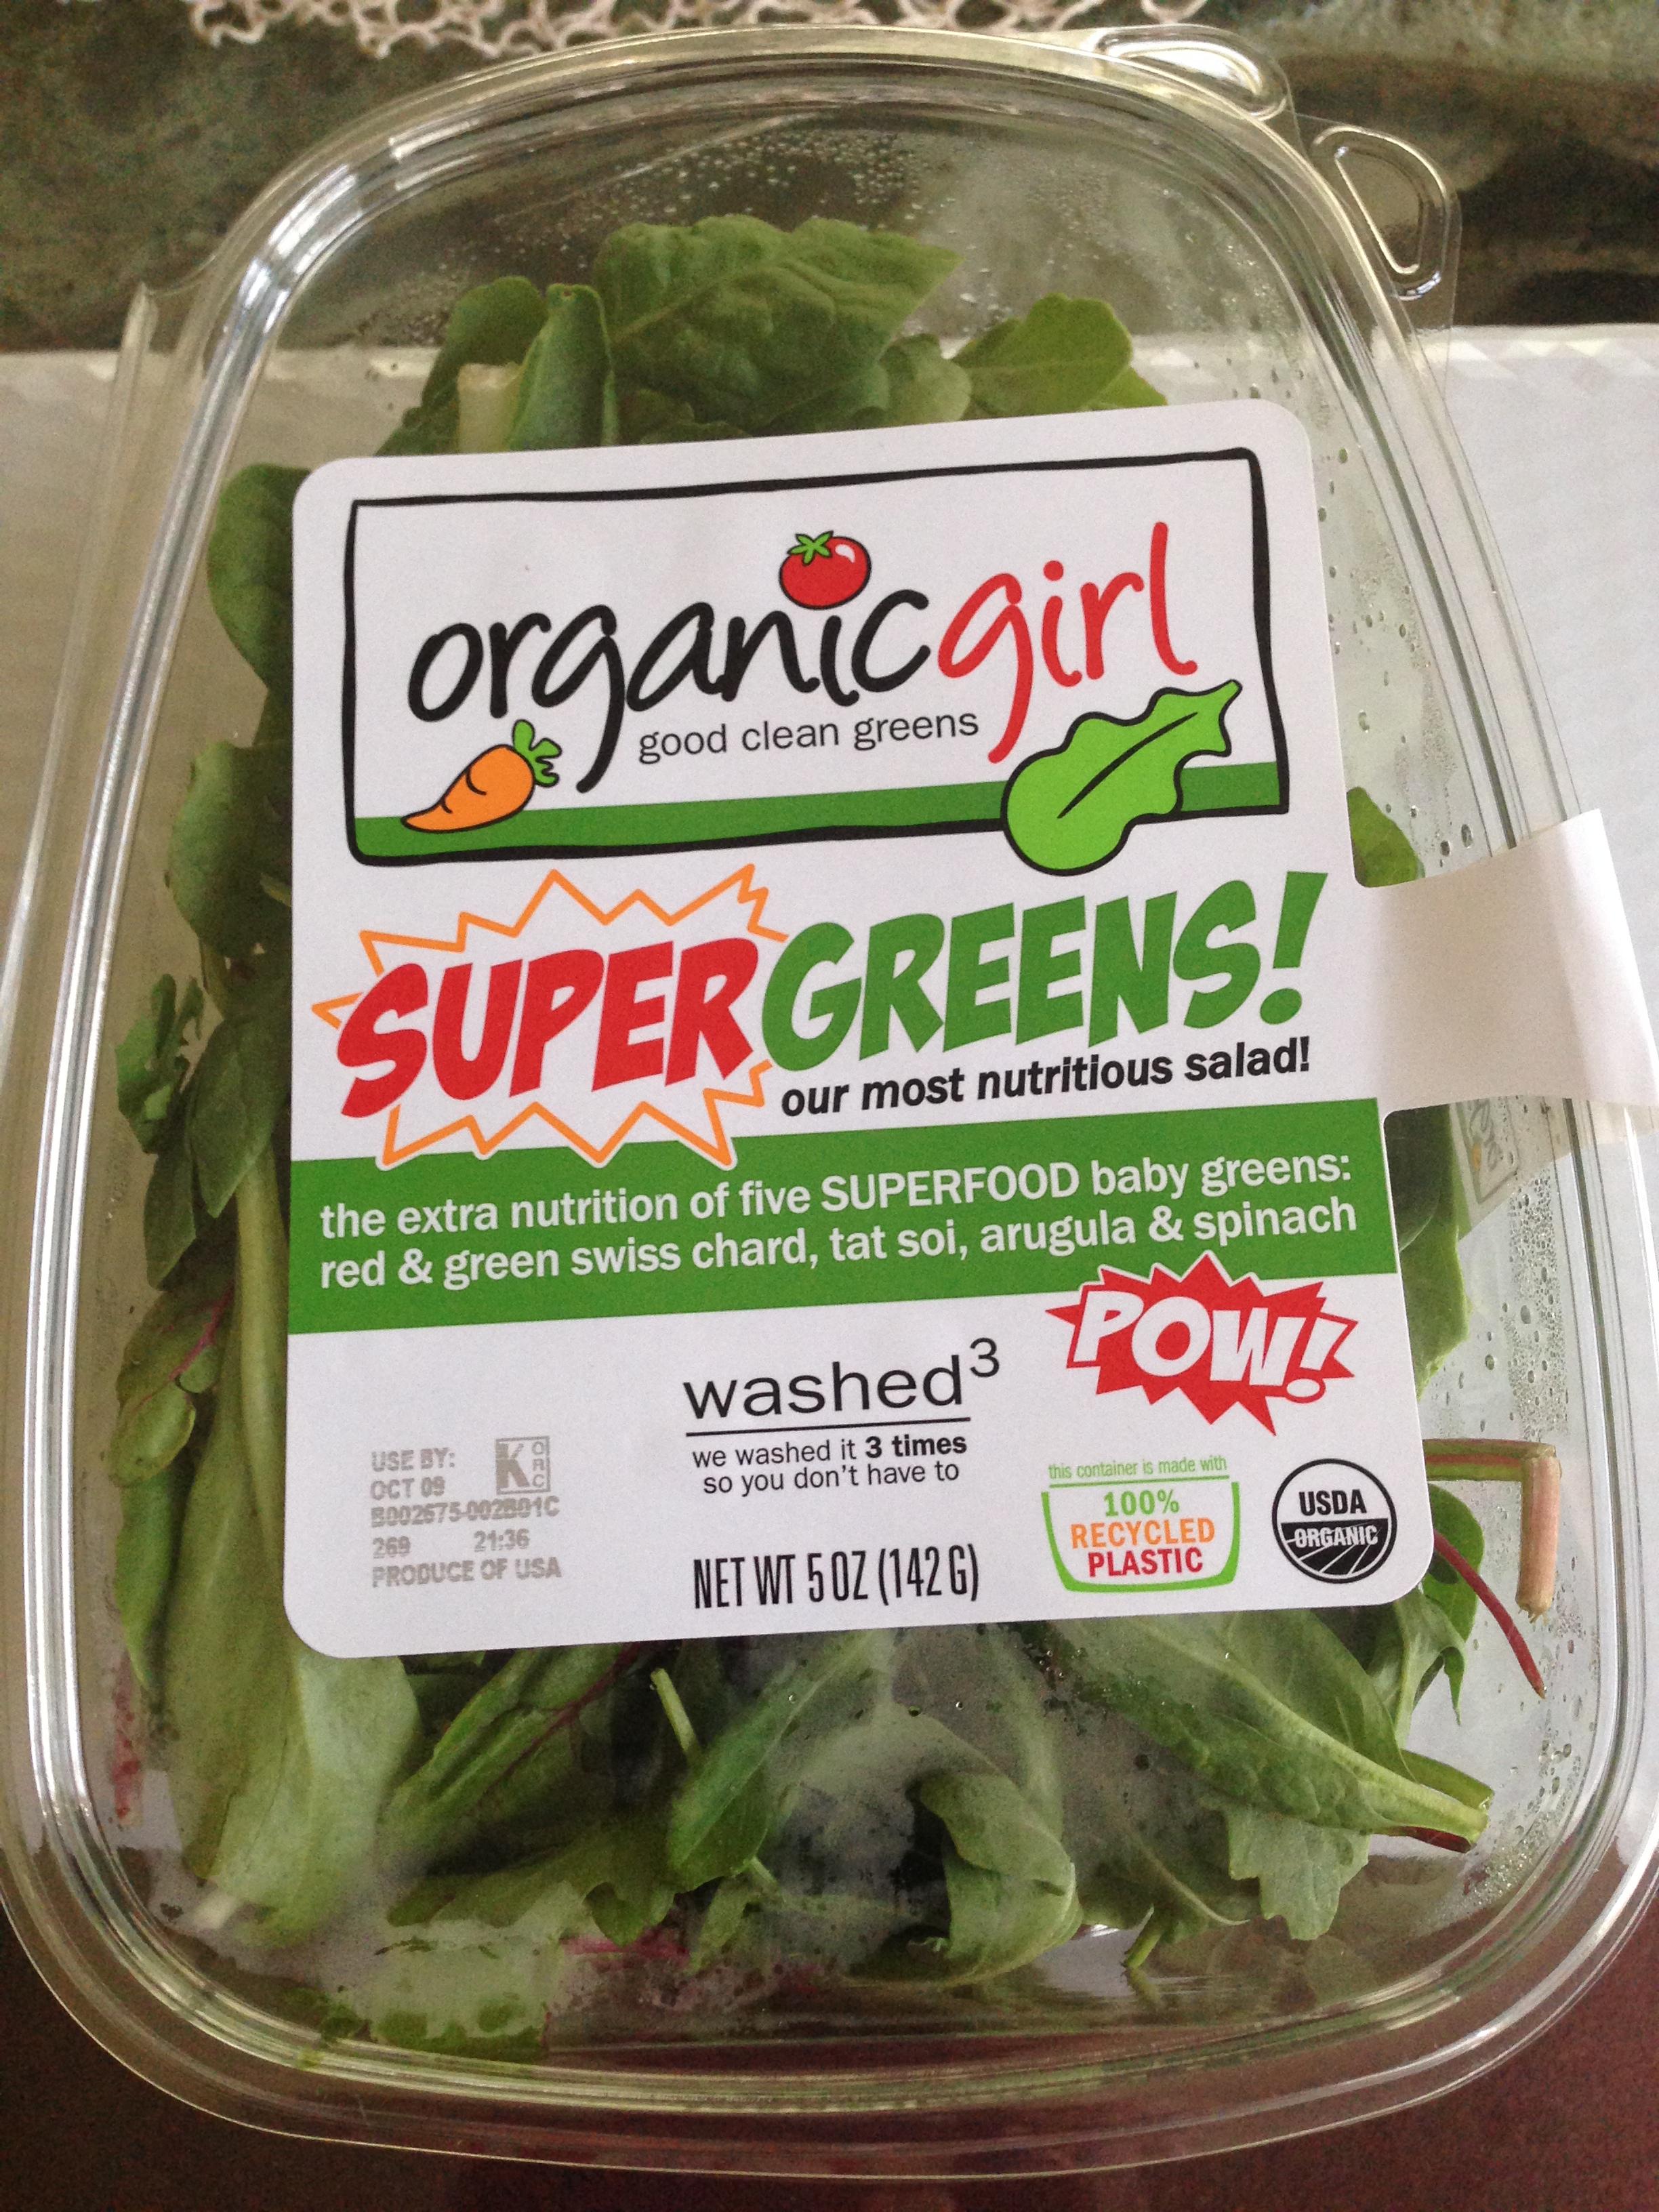 Organic Girl SuperGreens